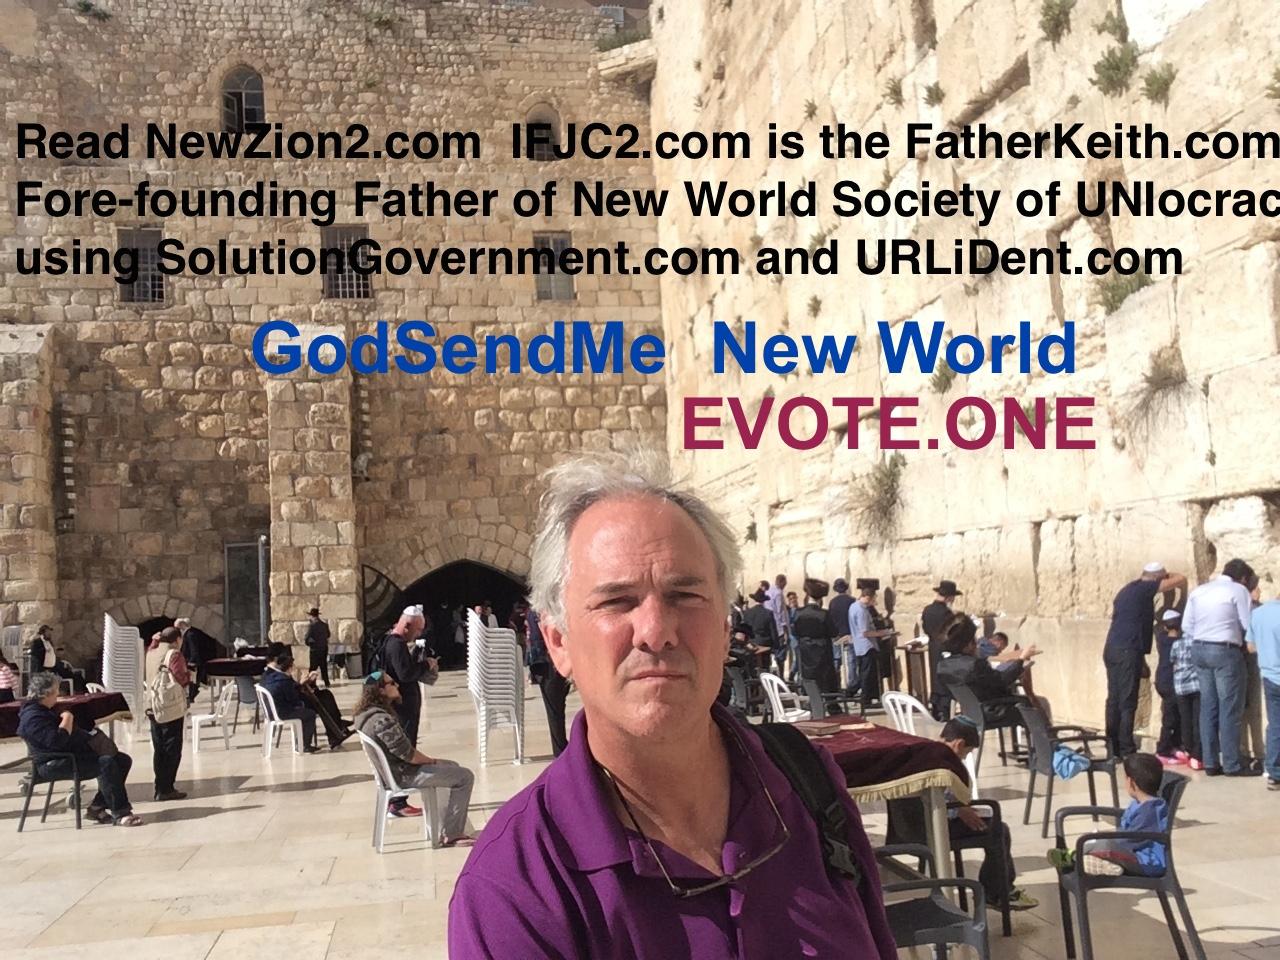 BBK20150403-JerUSAlem-KeithNewWorldCrusader-headShot-GodSendMe